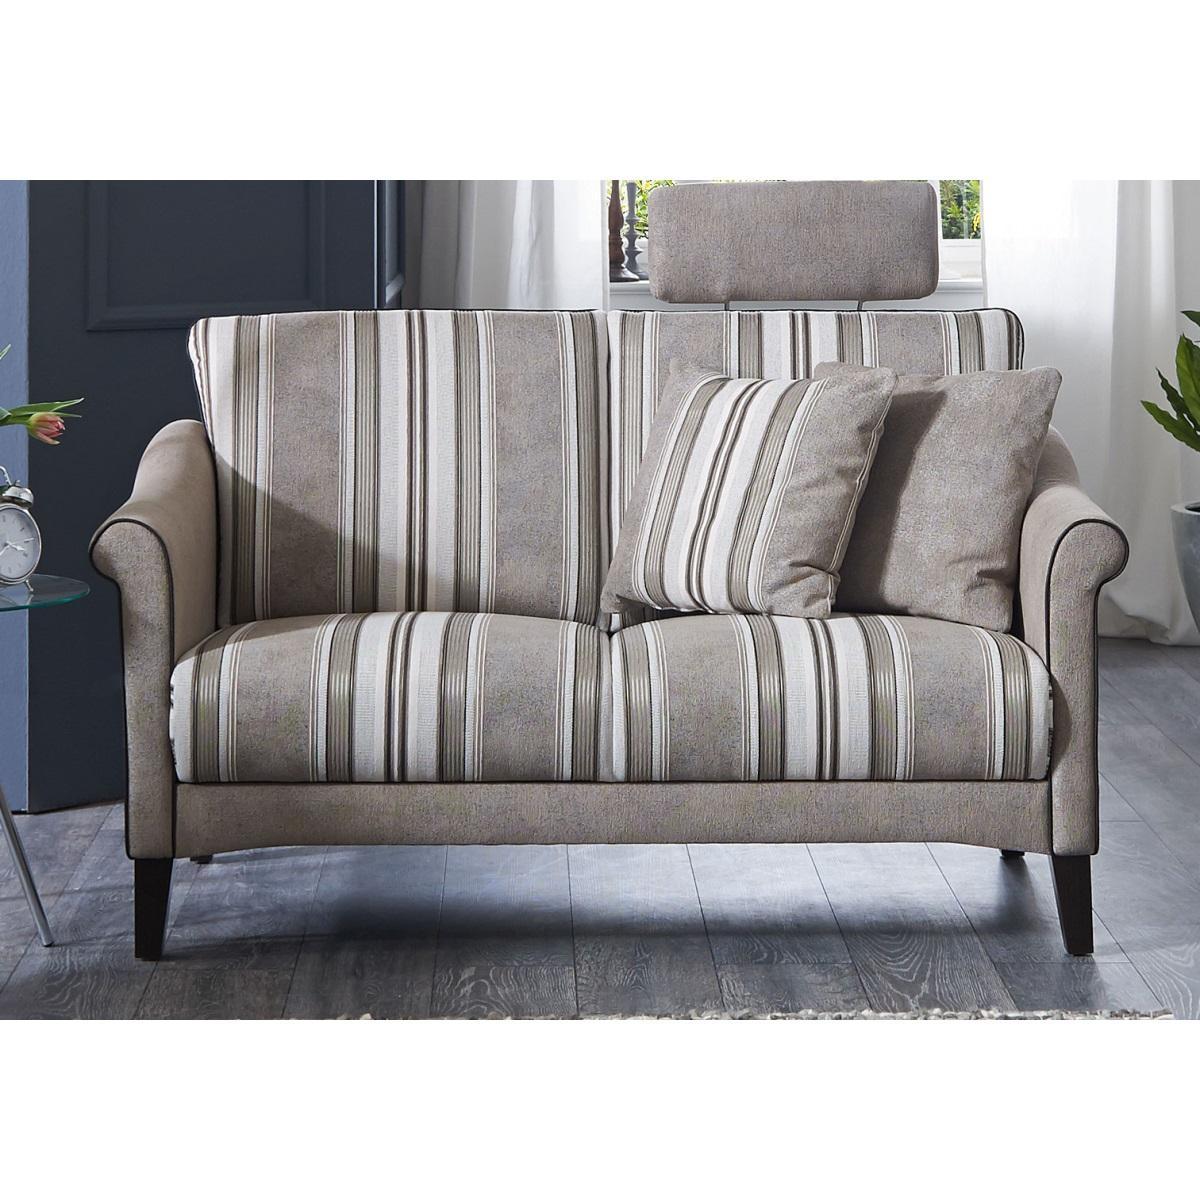 Full Size of Mondo Sofa Erfahrungen Kaufen Leder Couch Srl Bertinoro Orari Group 3 Agata Meble Softline Bed Capocolle Brick 2 Online Luminara Stoffbezug Beige Gestreift Ca Sofa Mondo Sofa